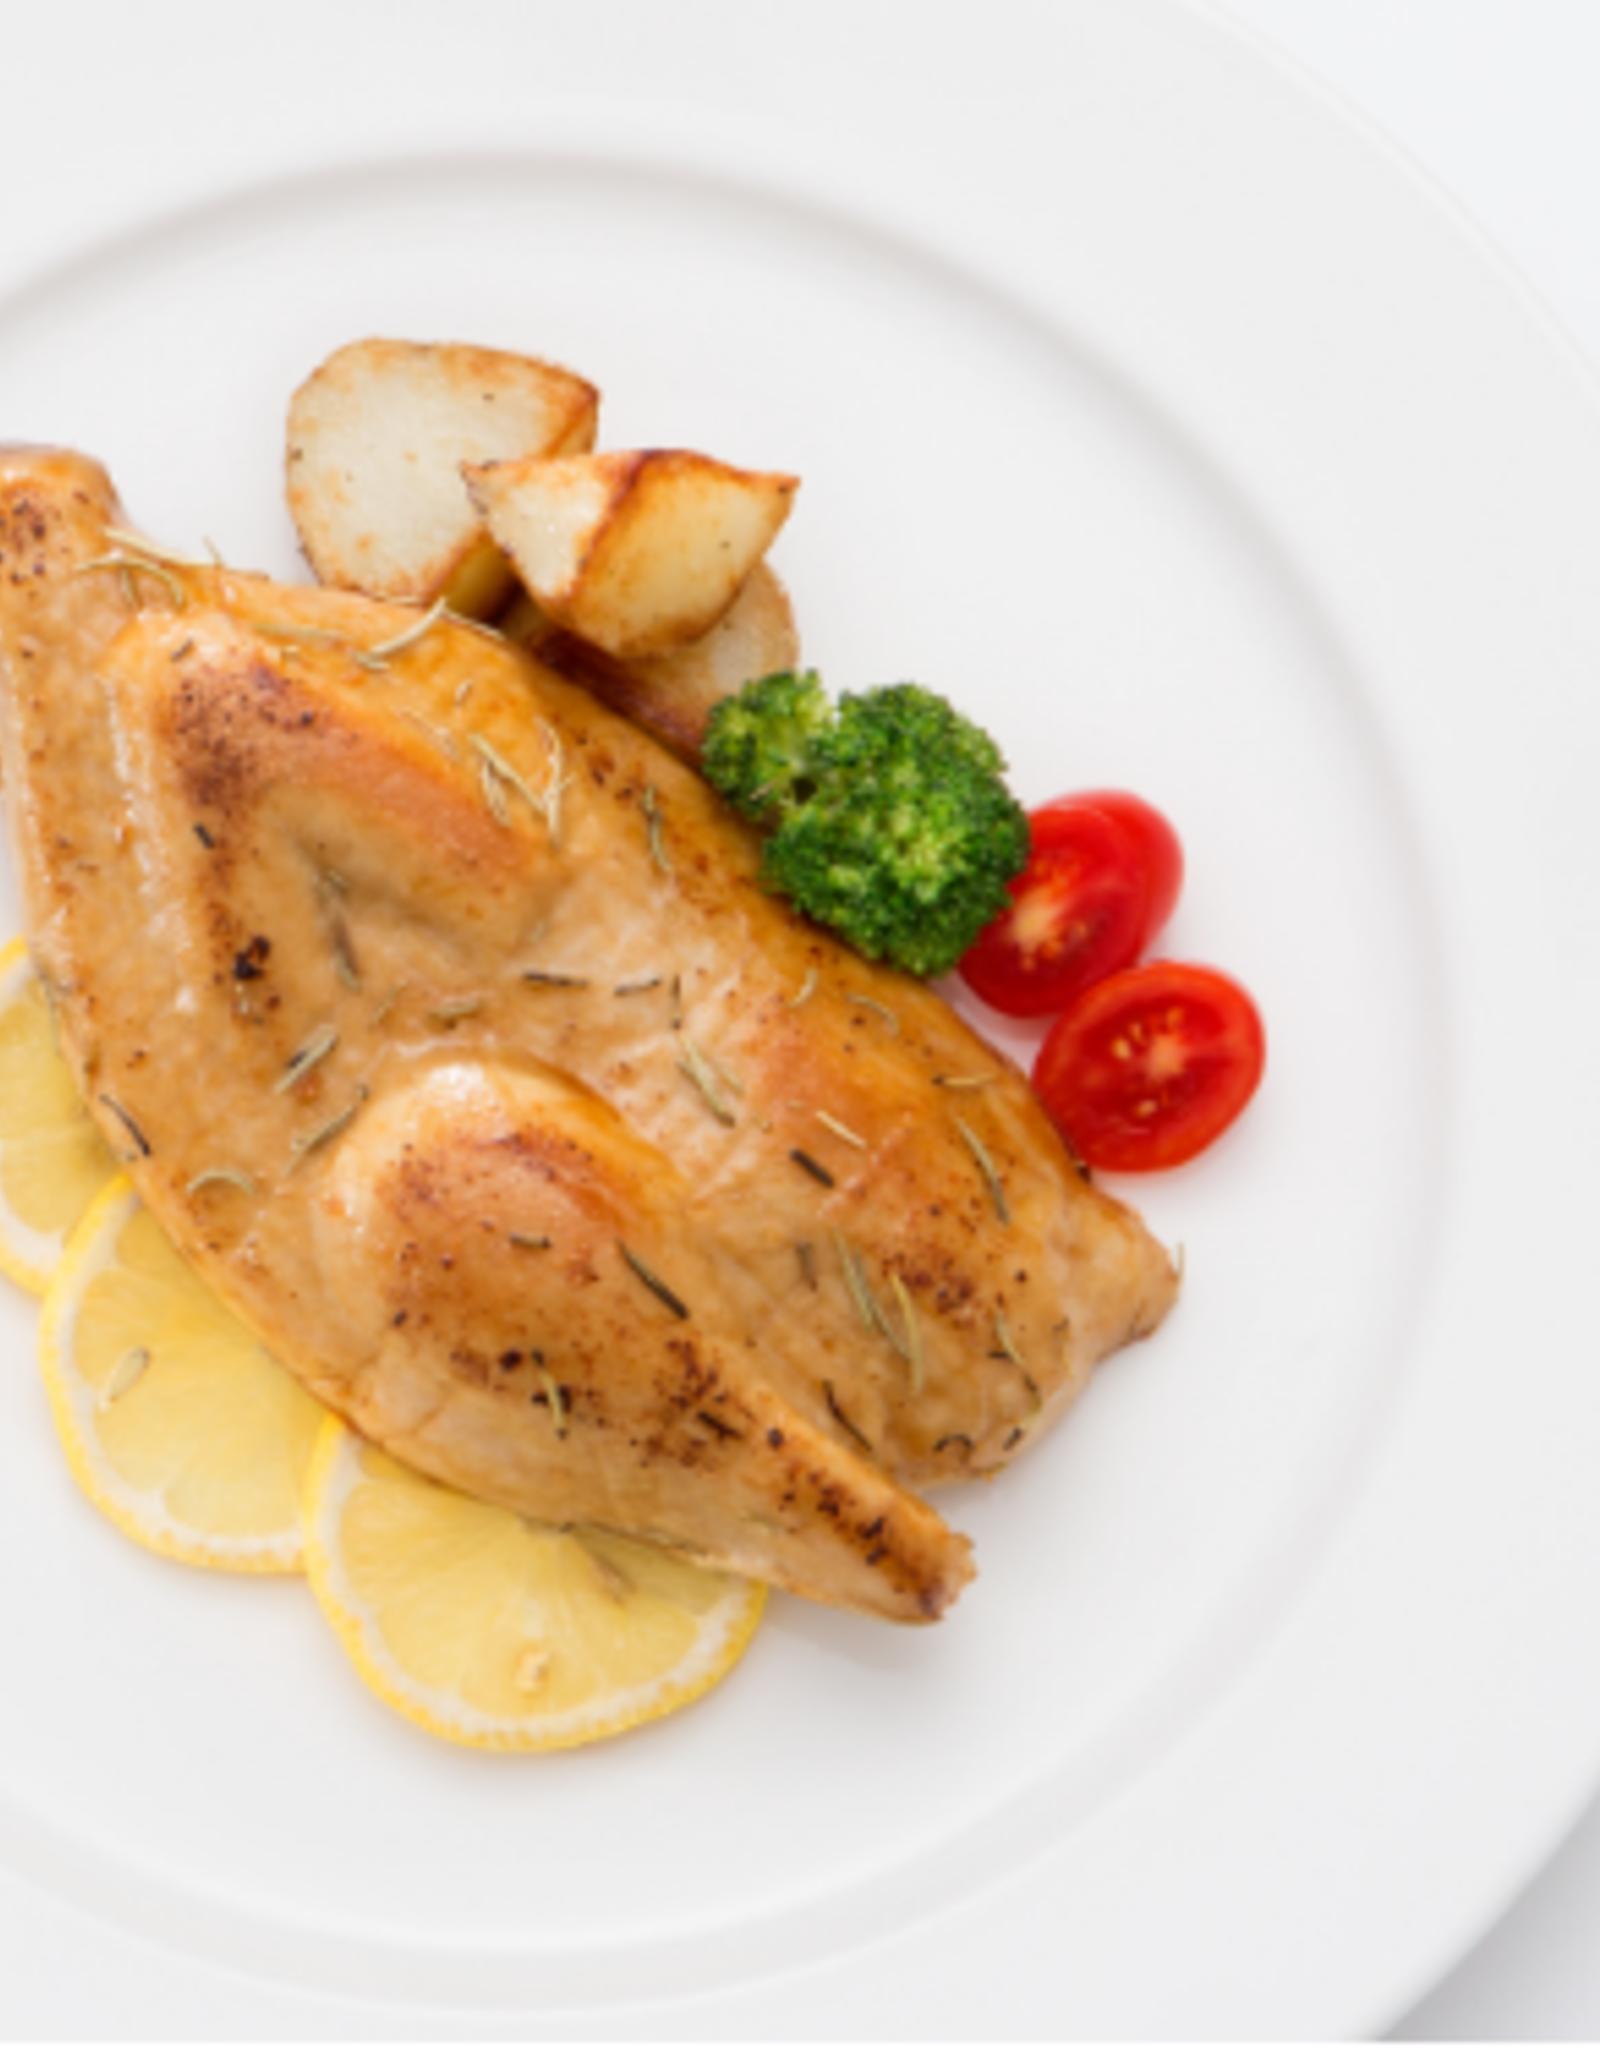 Vegefarm * 松珍 (VF) Vegan Half Chicken Breast(L)*(松珍) 無奶蛋香妃素雞 (L)